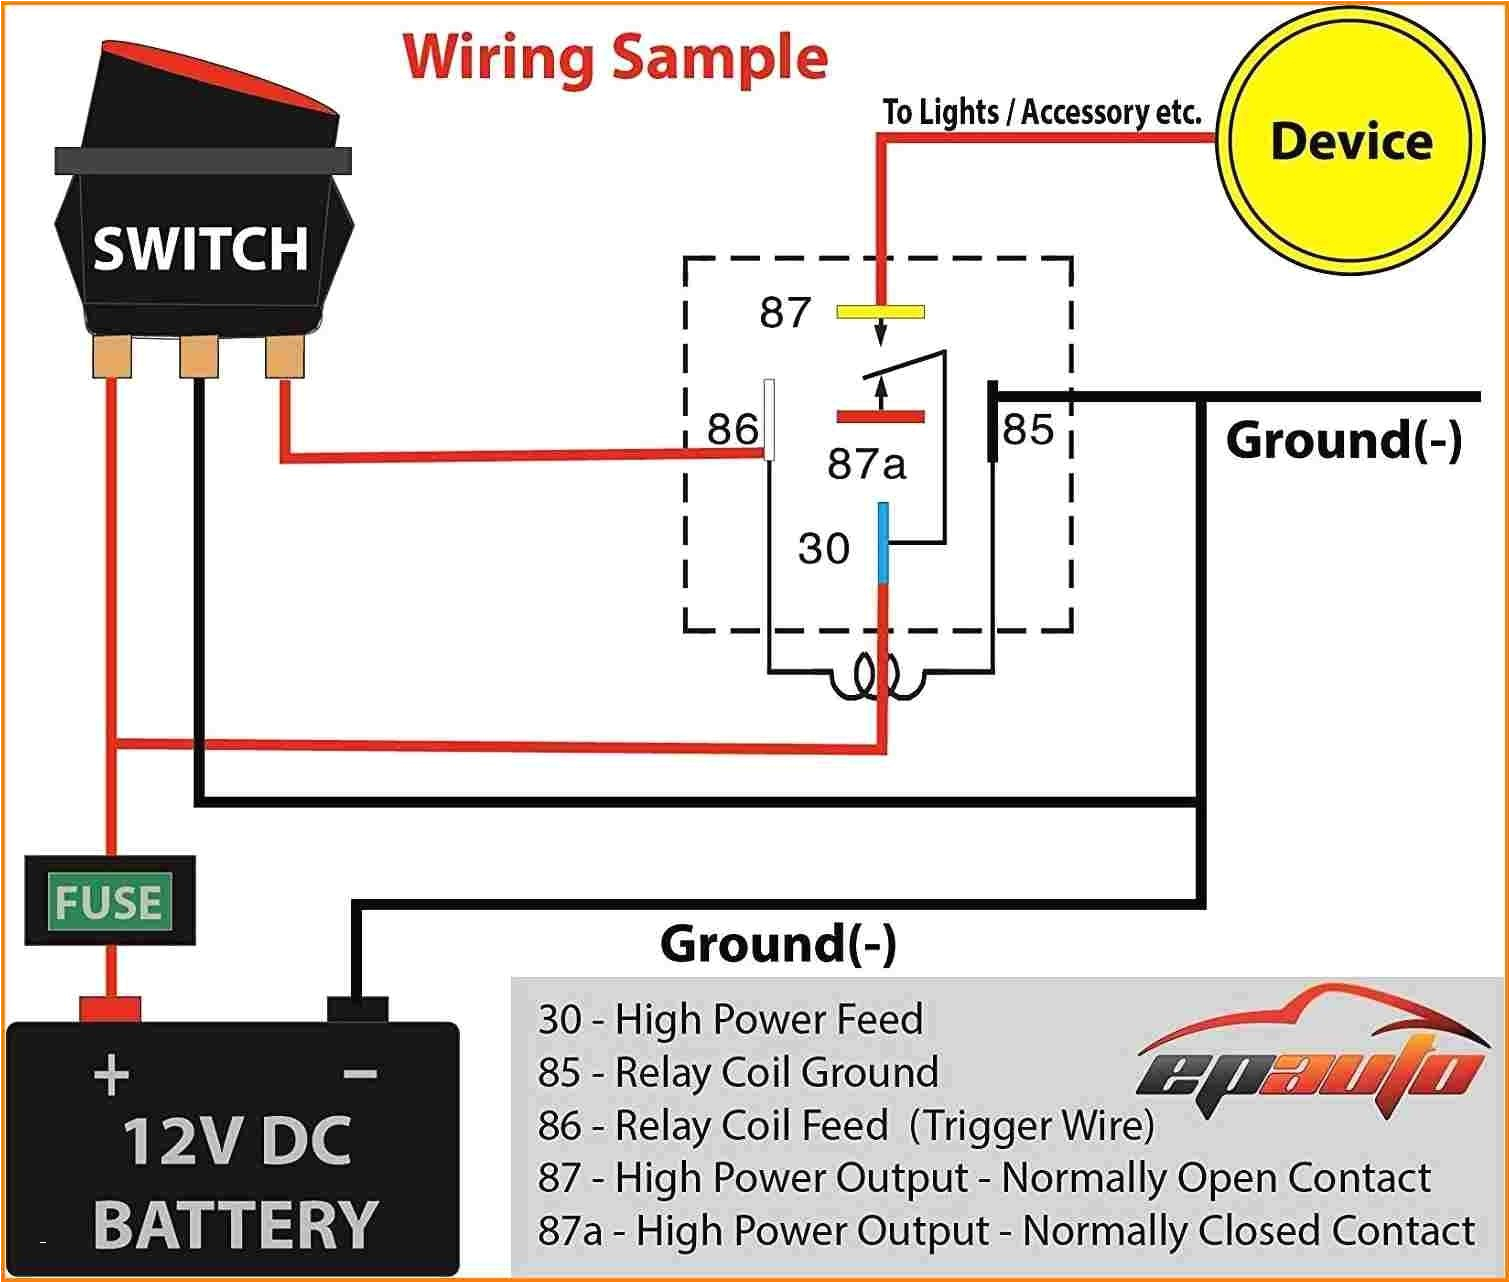 12v relay wiring diagram 5 pin elegant best bosch relay wiring diagram 5 pole electrical